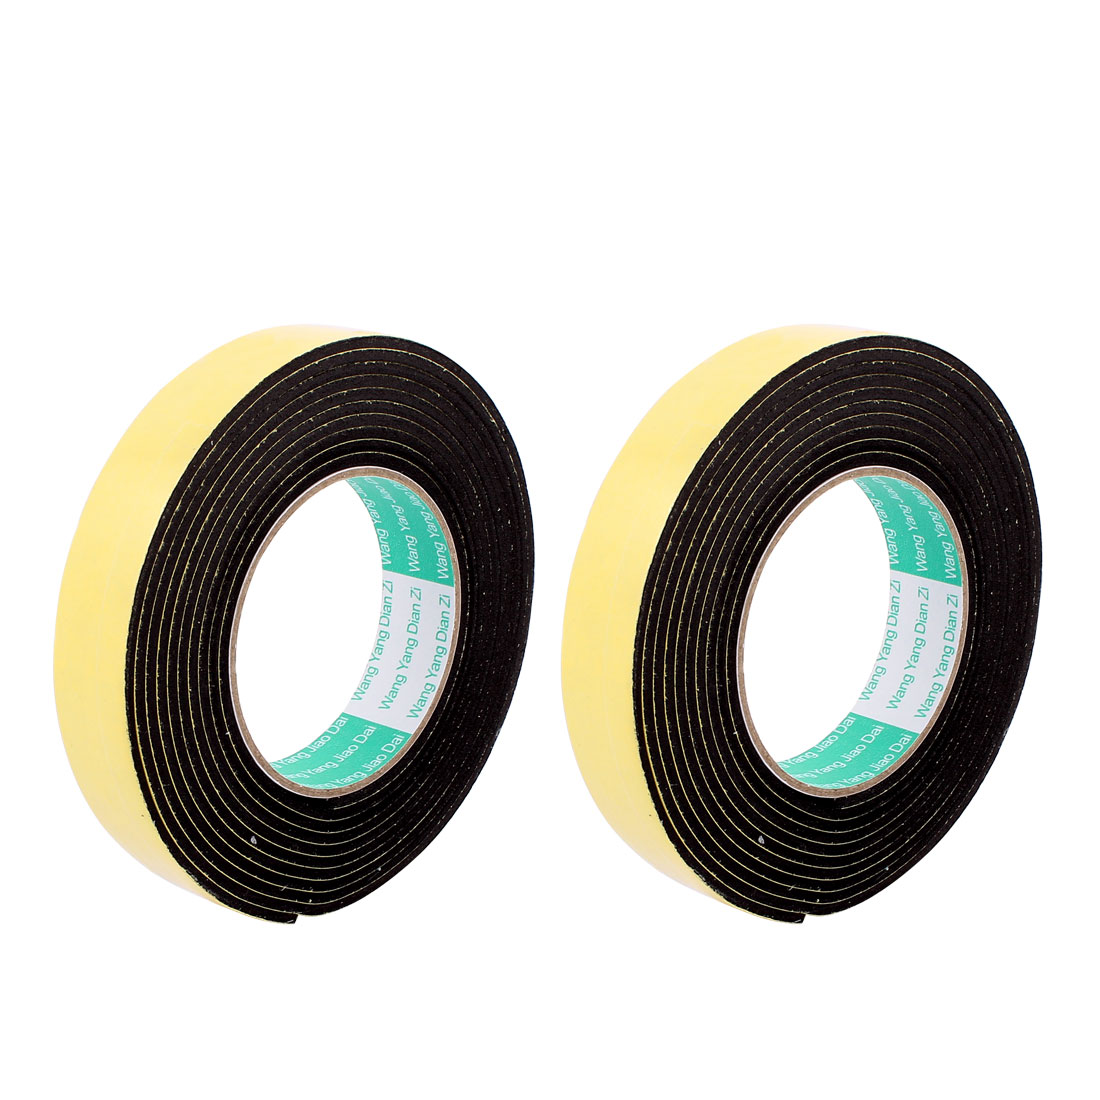 2pcs Black 2.5CM Wide 4M Length 3MM Thick Single Sided Shockproof Sponge Tape